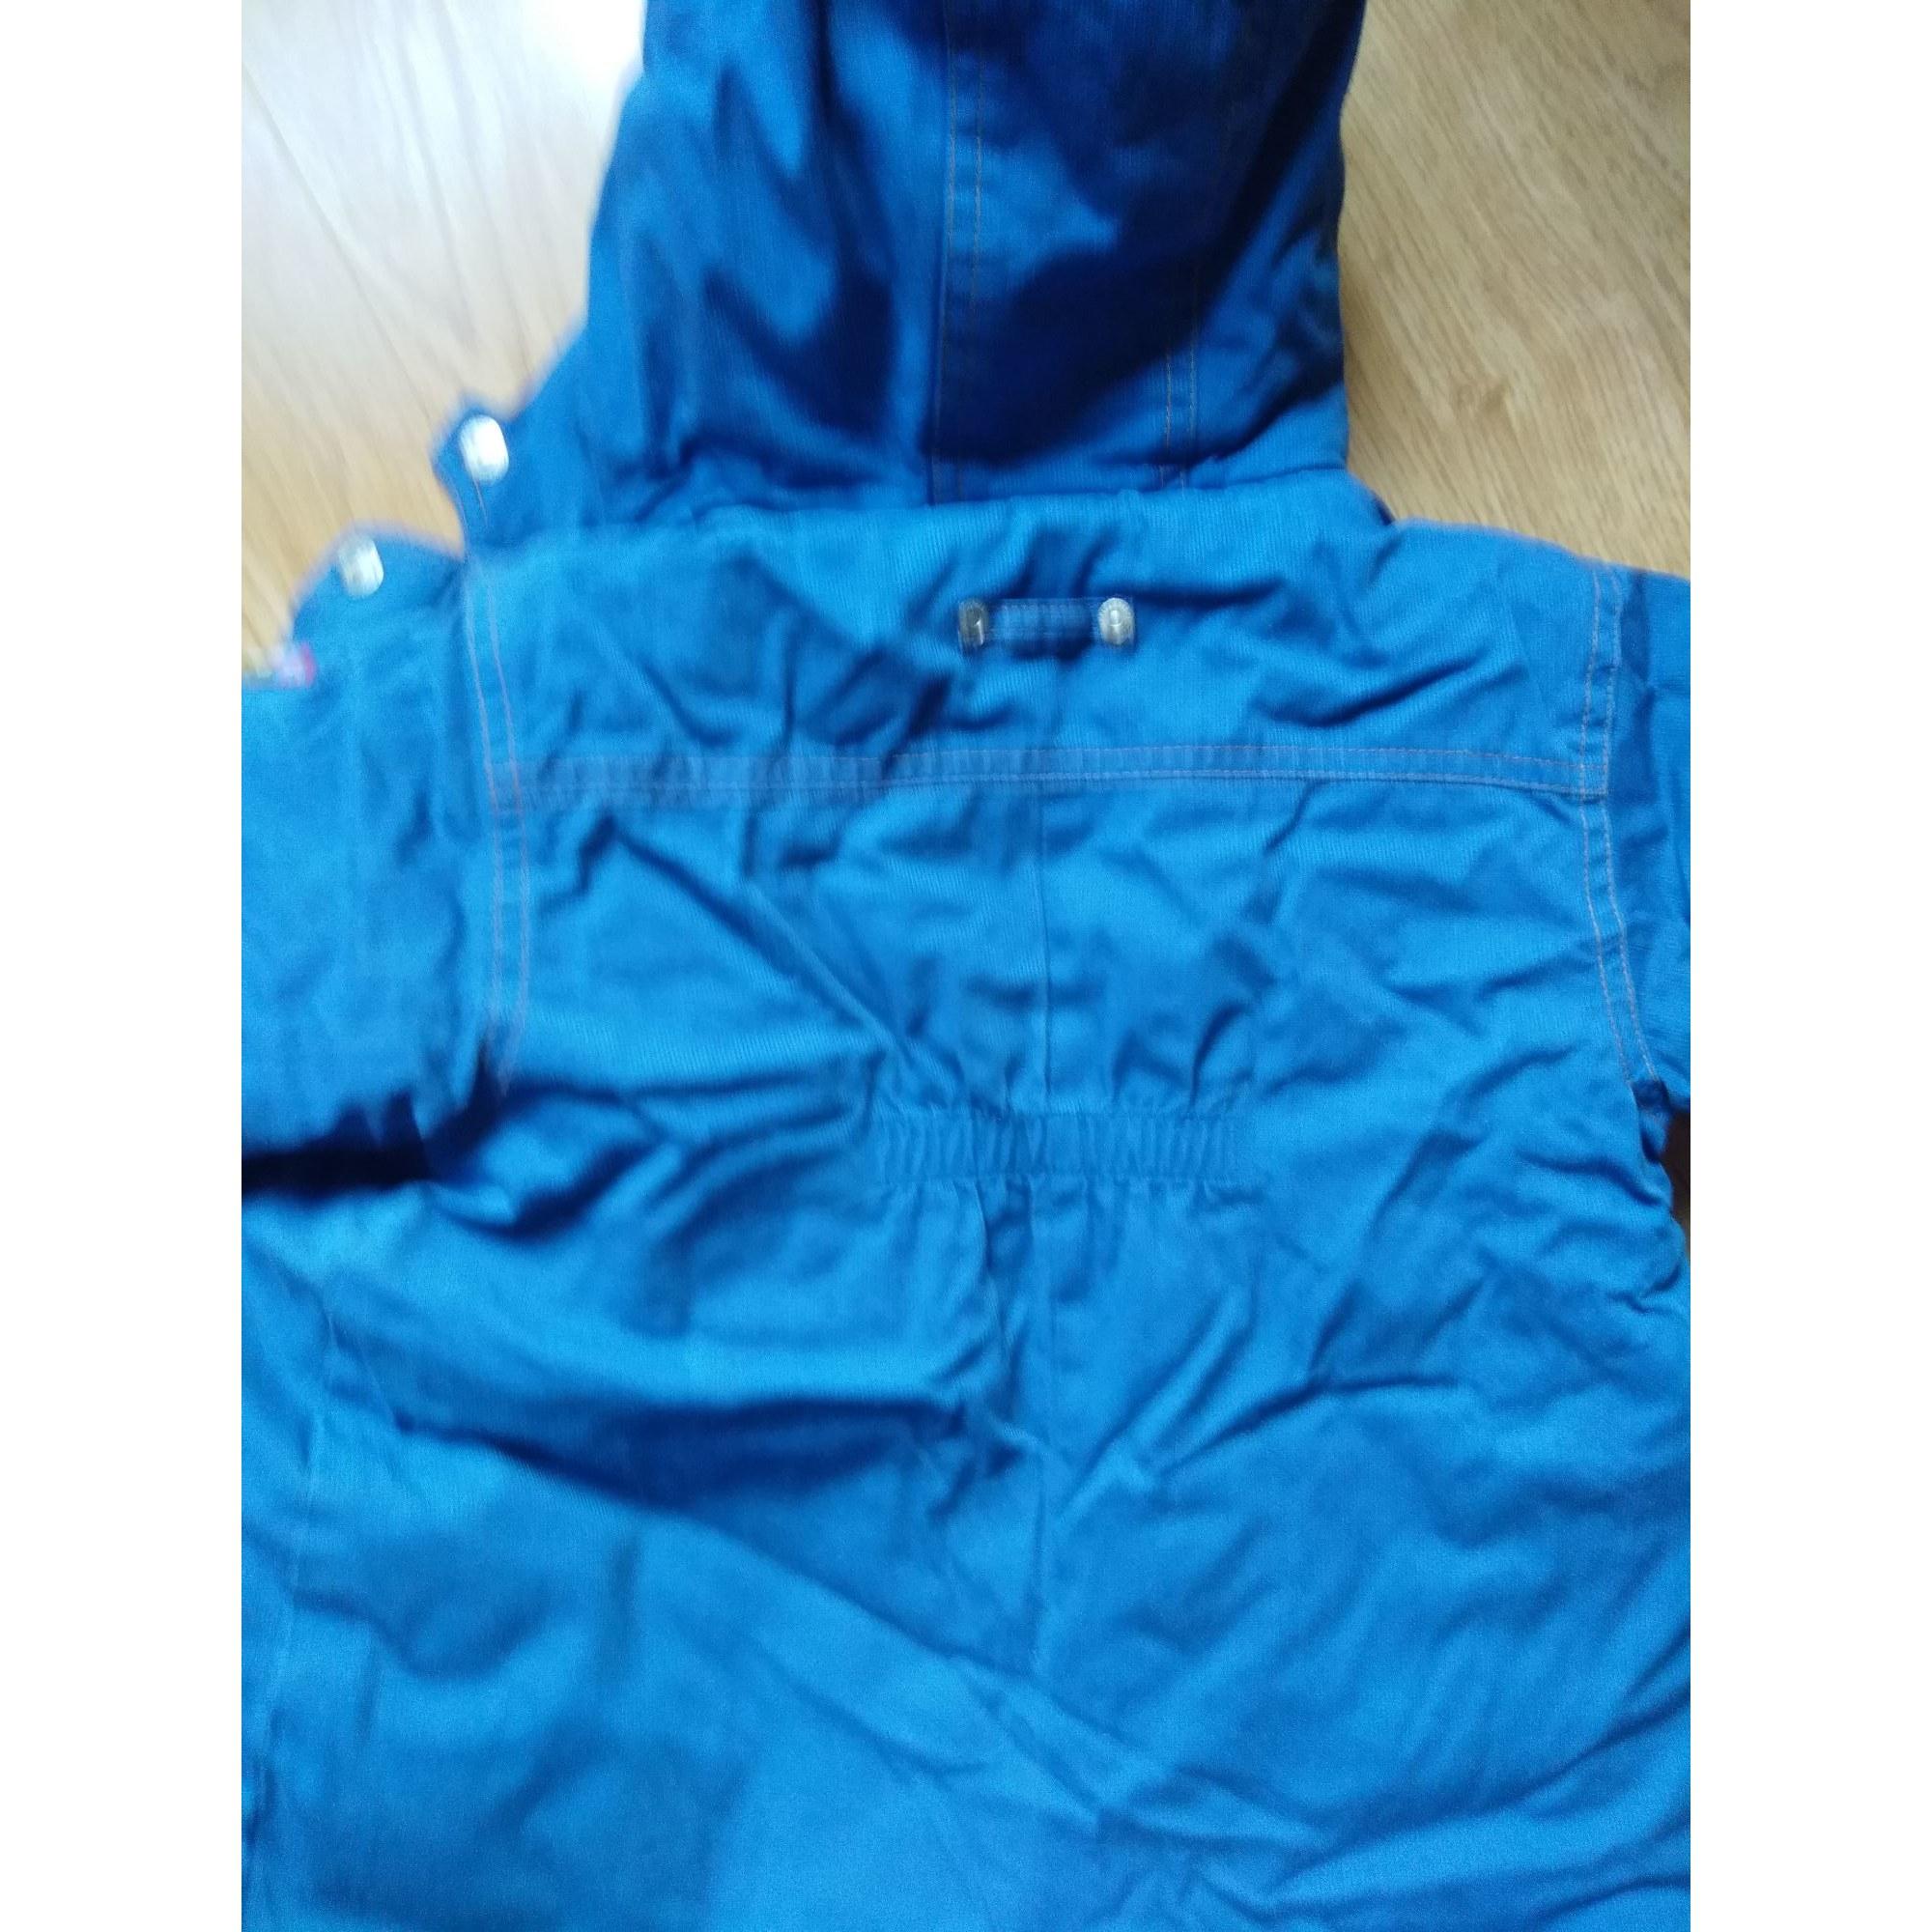 Ensemble & Combinaison pantalon LA COMPAGNIE DES PETITS Bleu, bleu marine, bleu turquoise